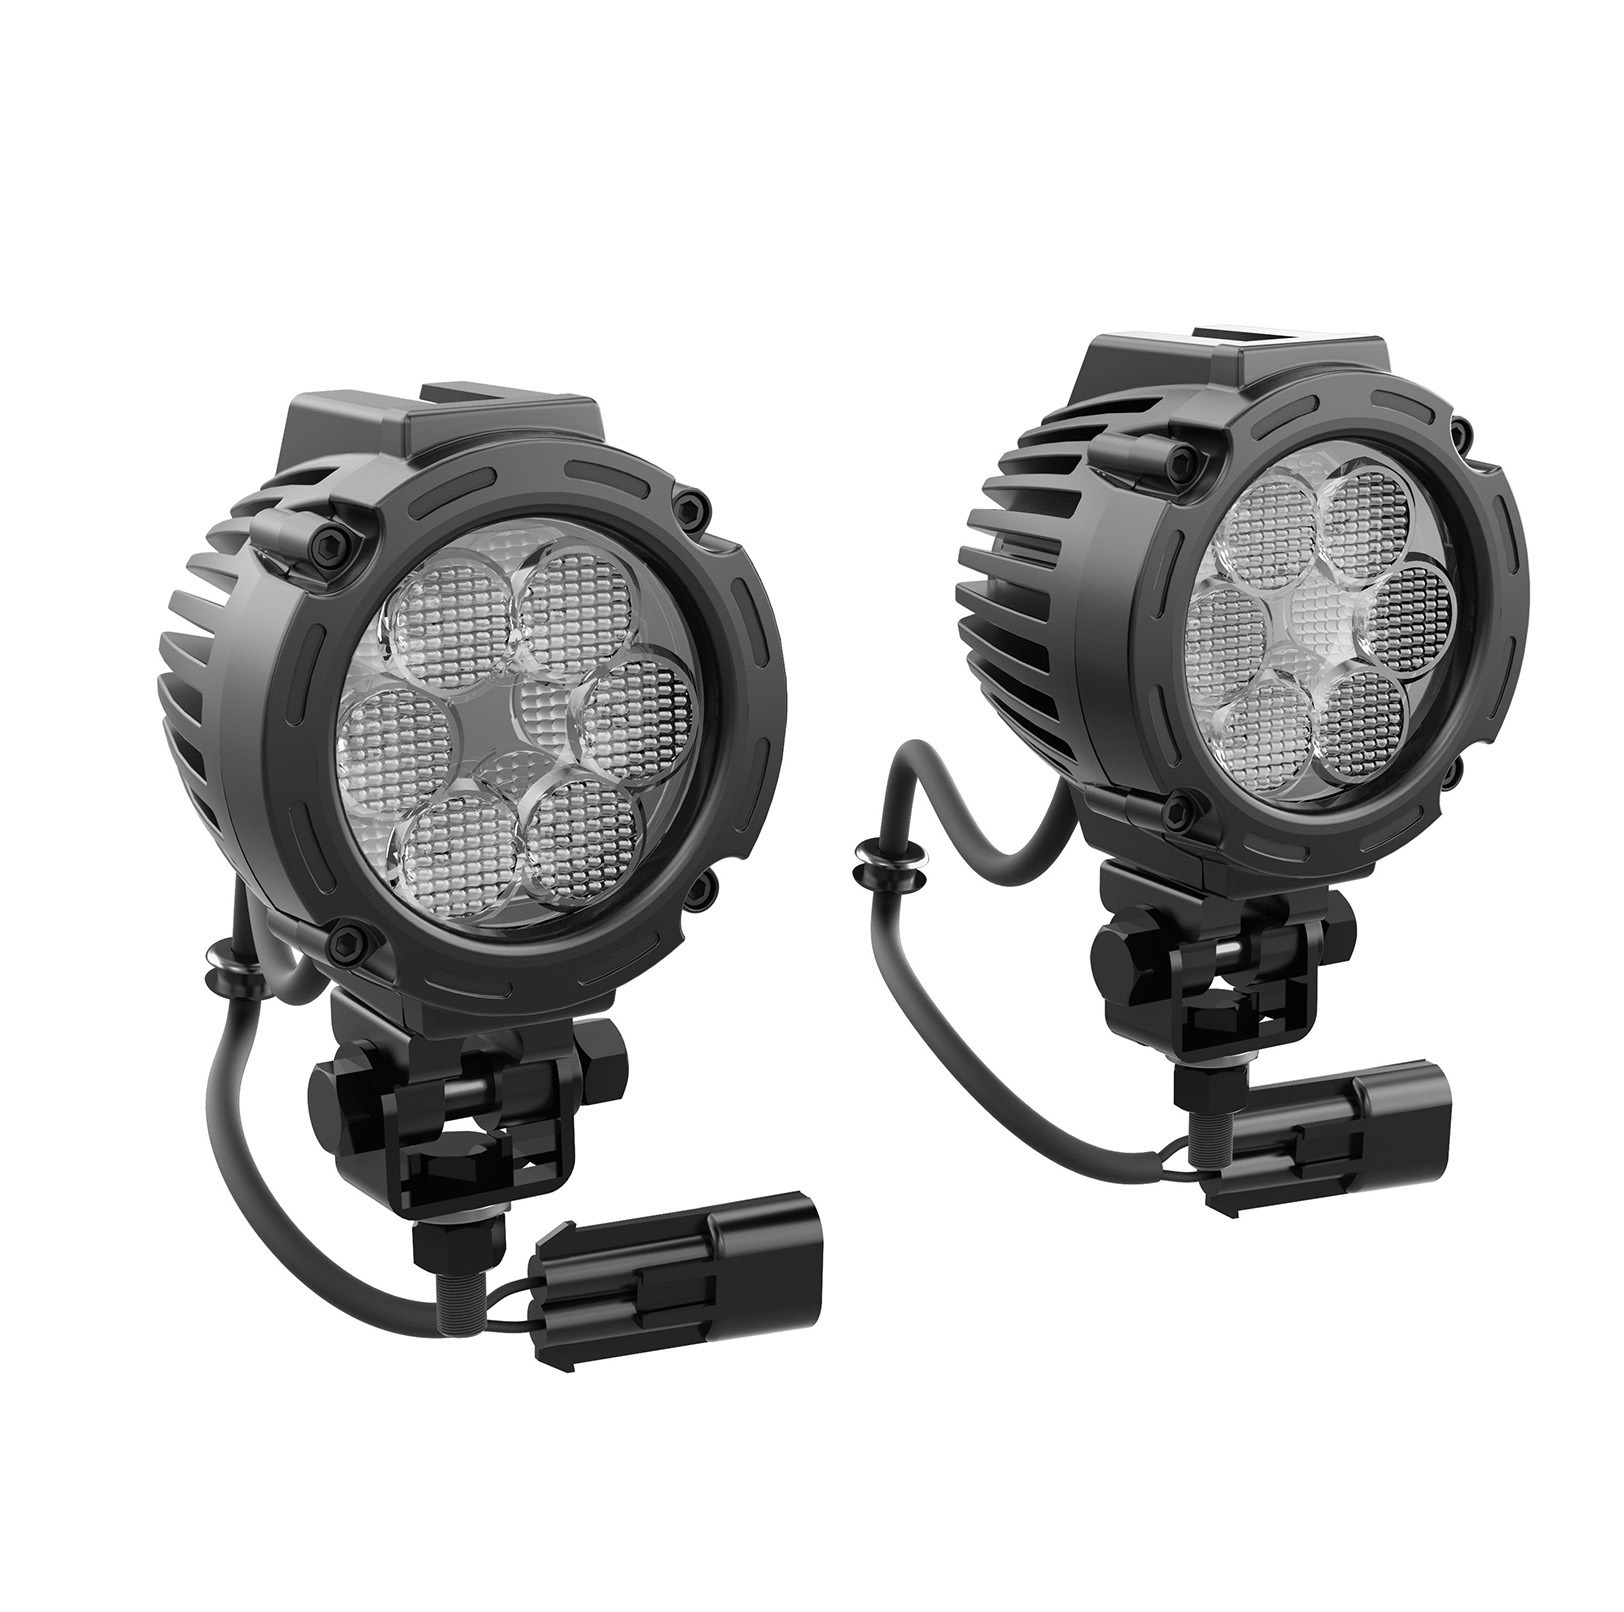 3.5 (9 CM) LED FLOOD LIGHTS (2 X 14W)